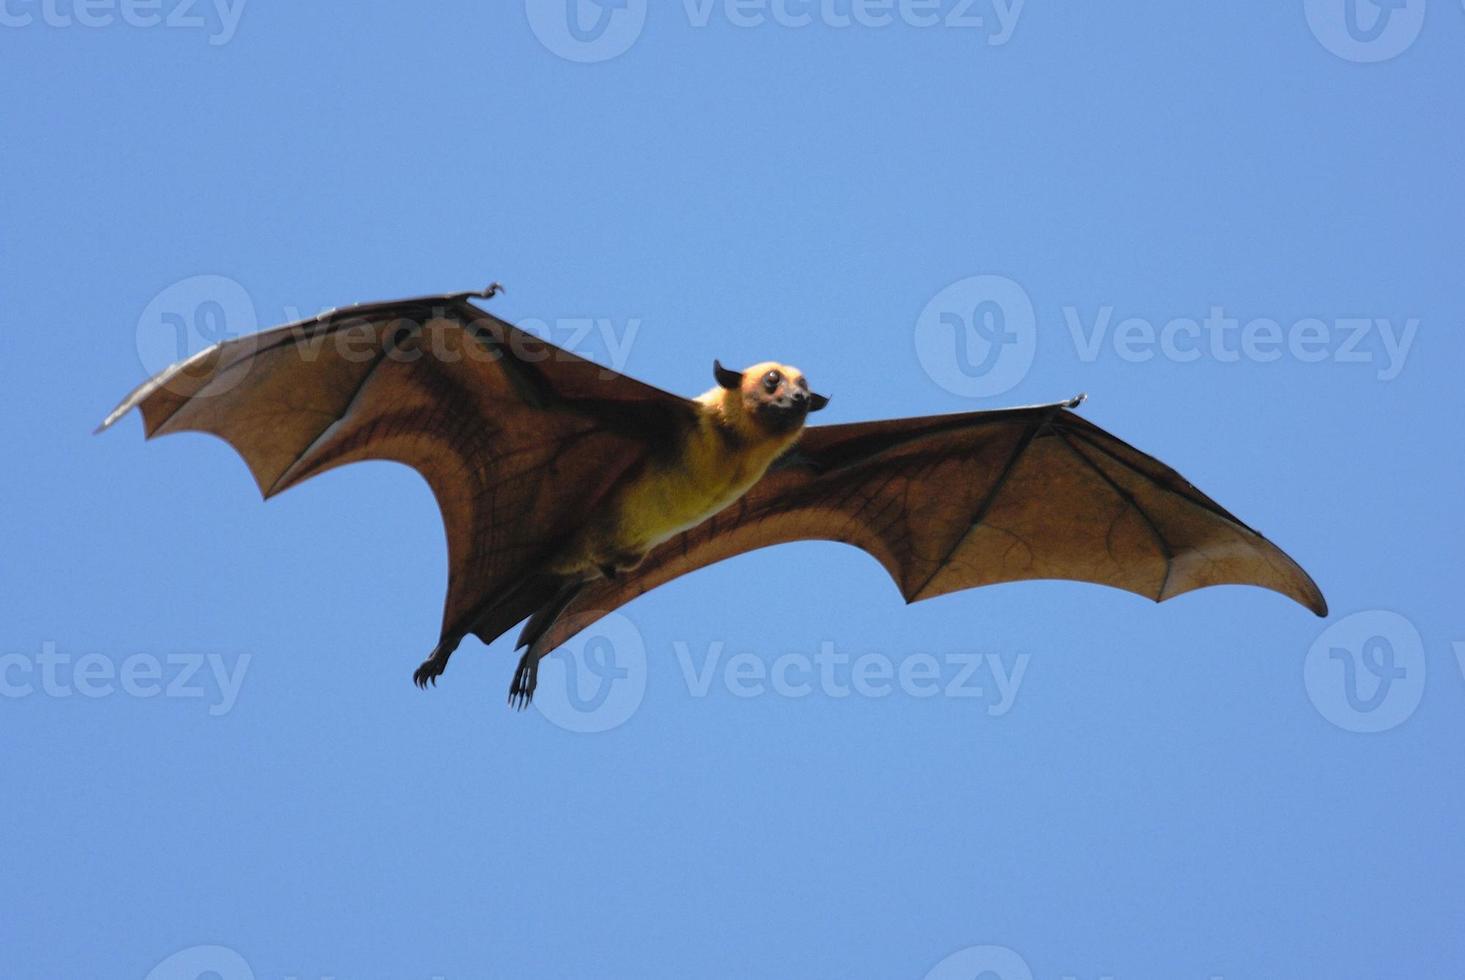 Flughund (Pteropus giganteus) in Sri Lanka foto